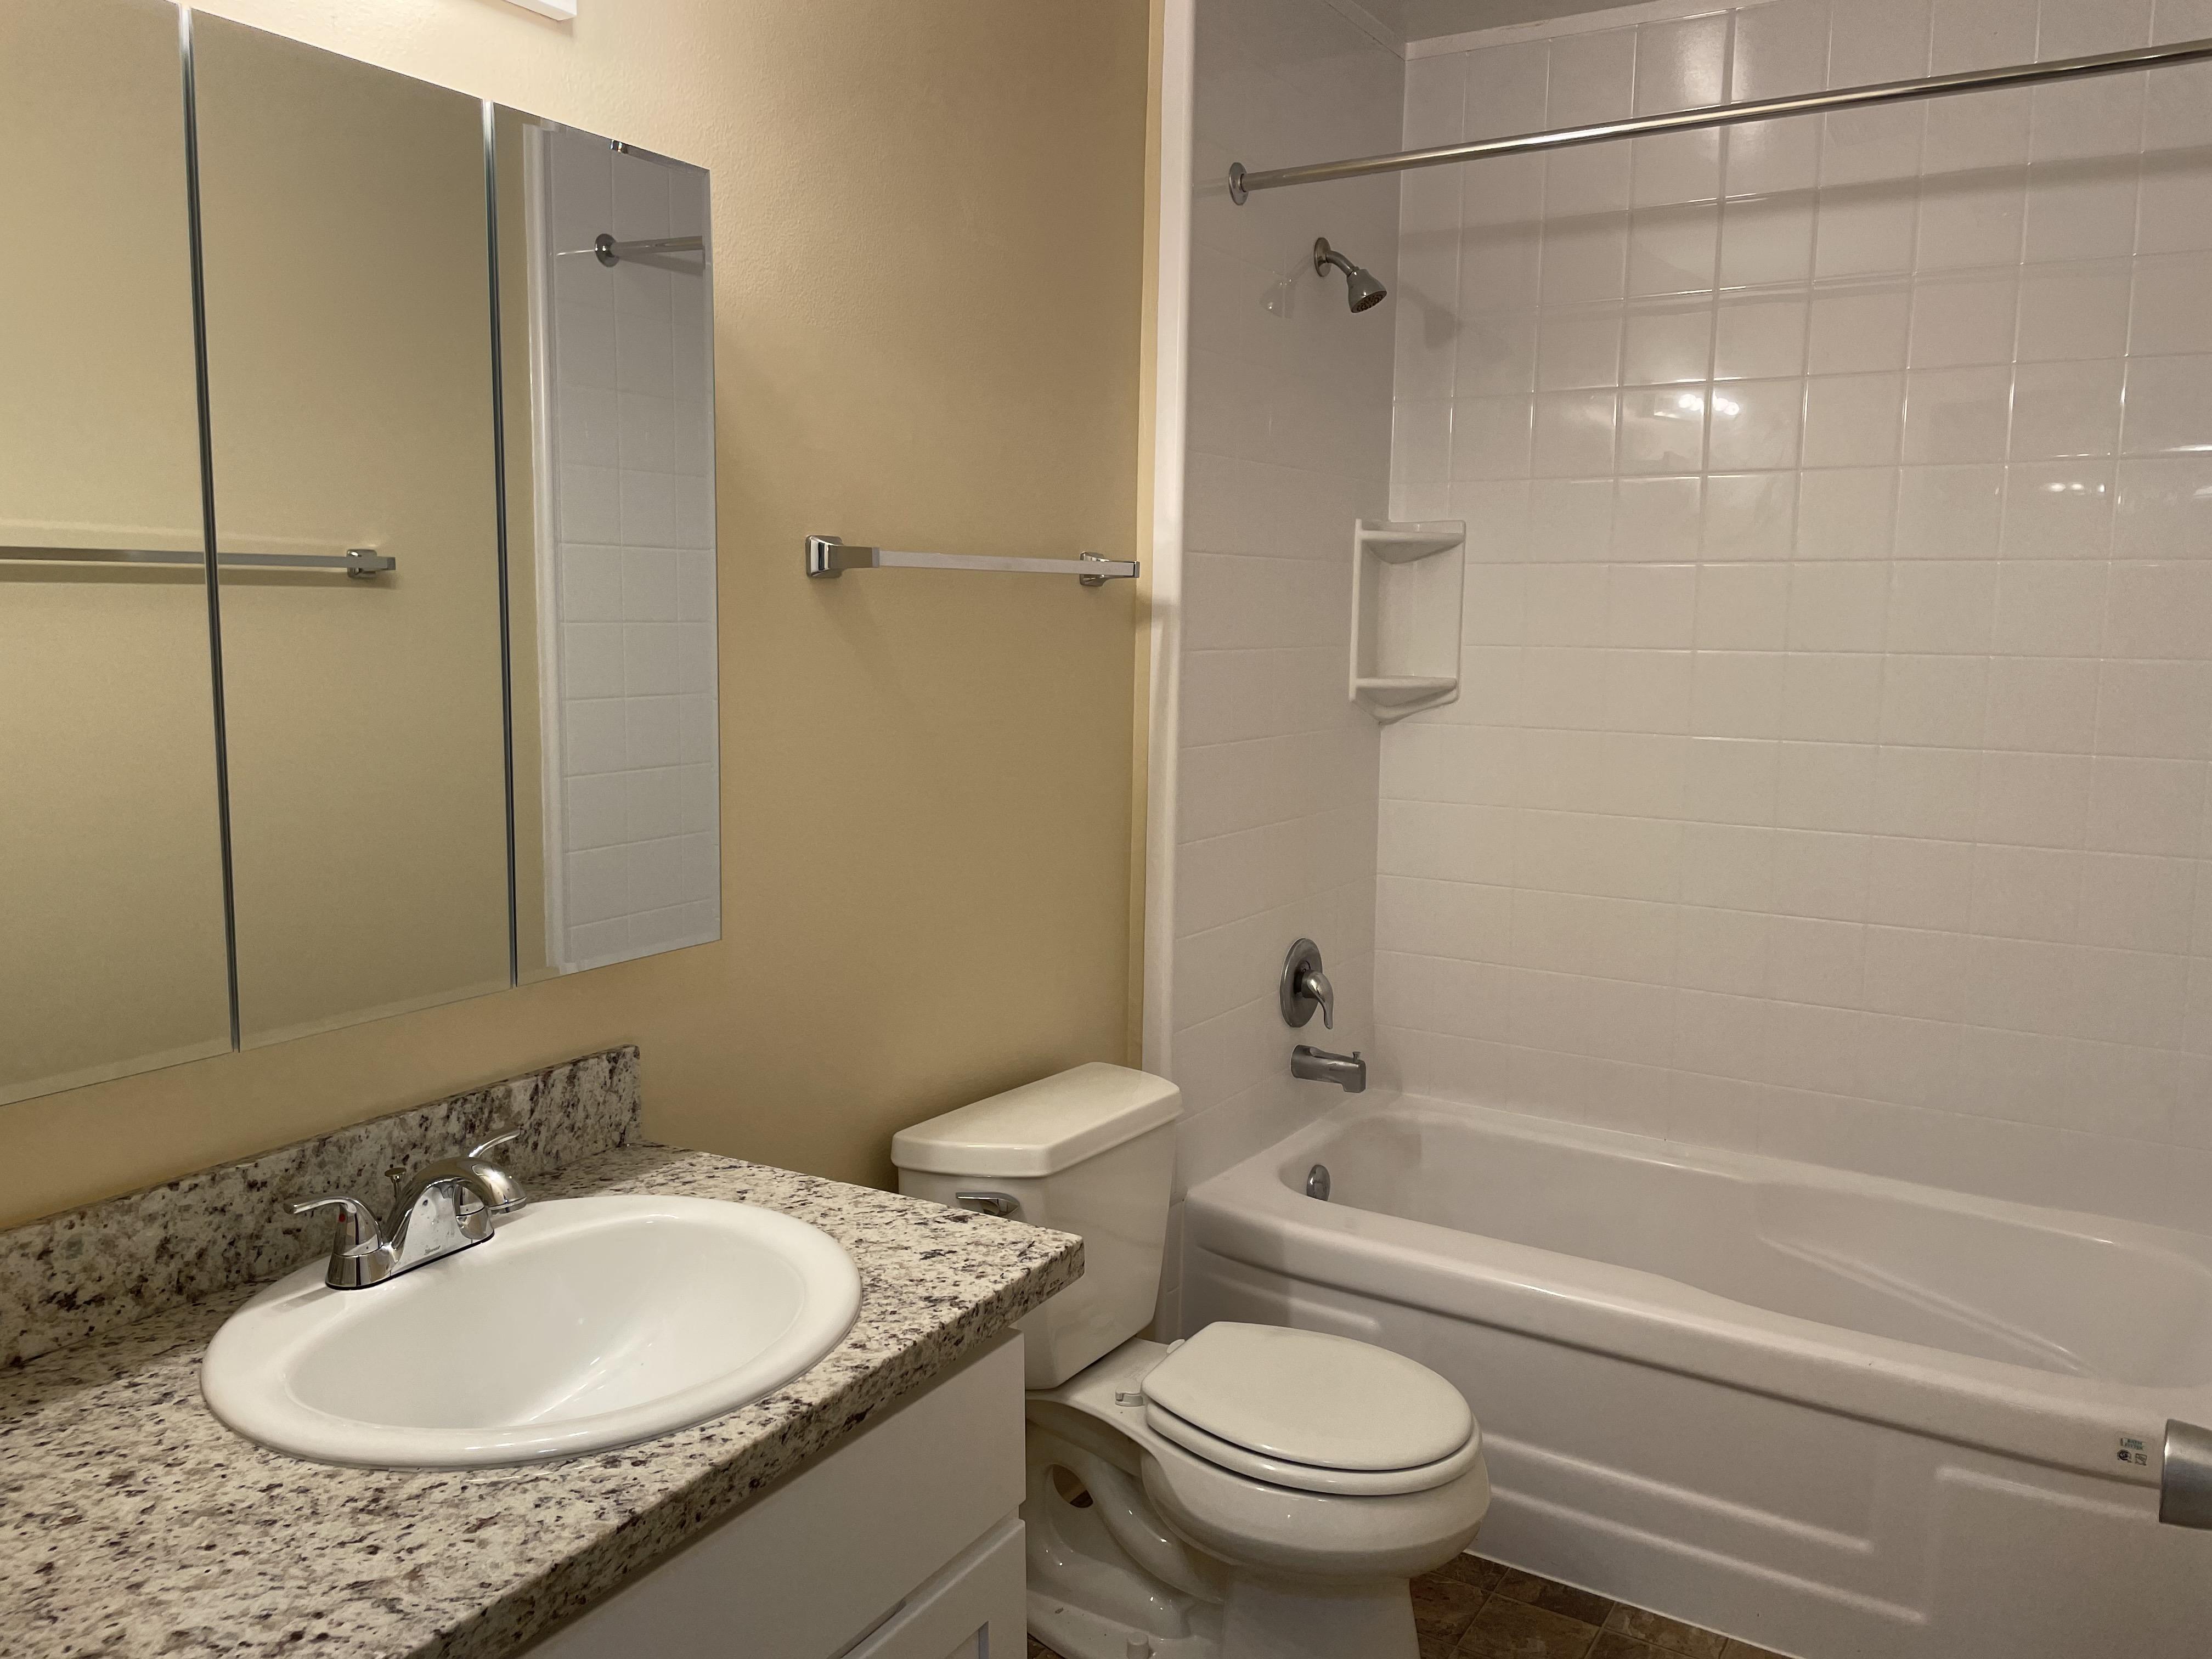 The bathroom has  a new: granite countertop, sink, cabinet, and medicine cabinet.